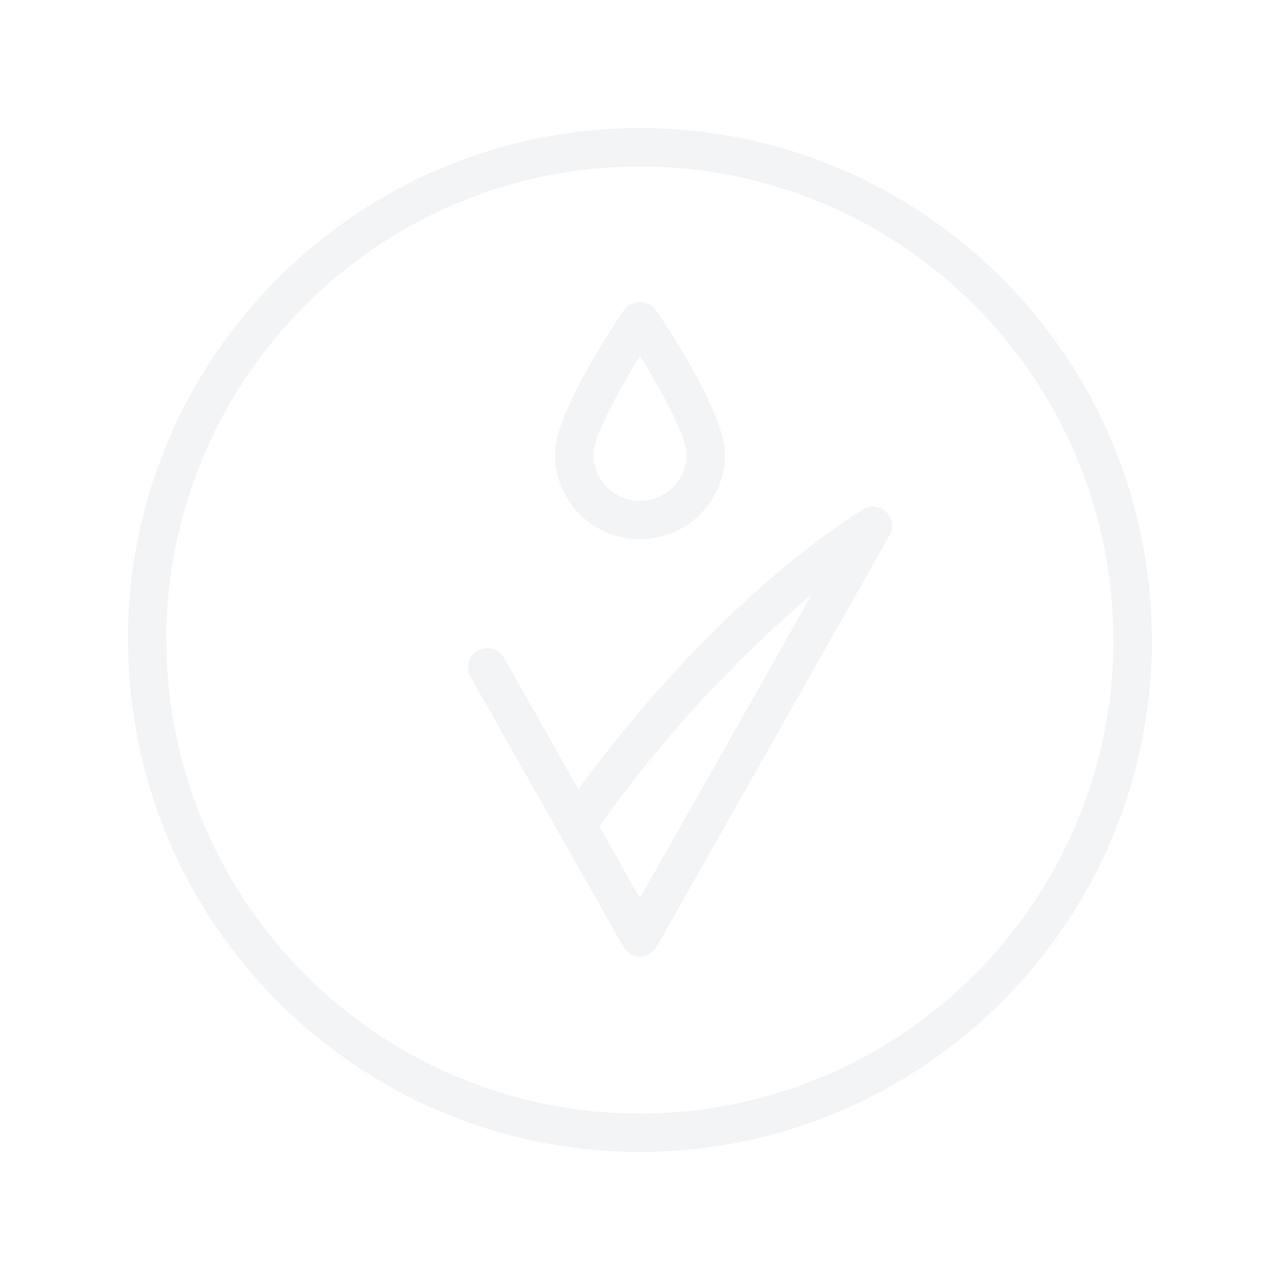 Clinique Chubby Stick Intense Lip Colour Balm 3g